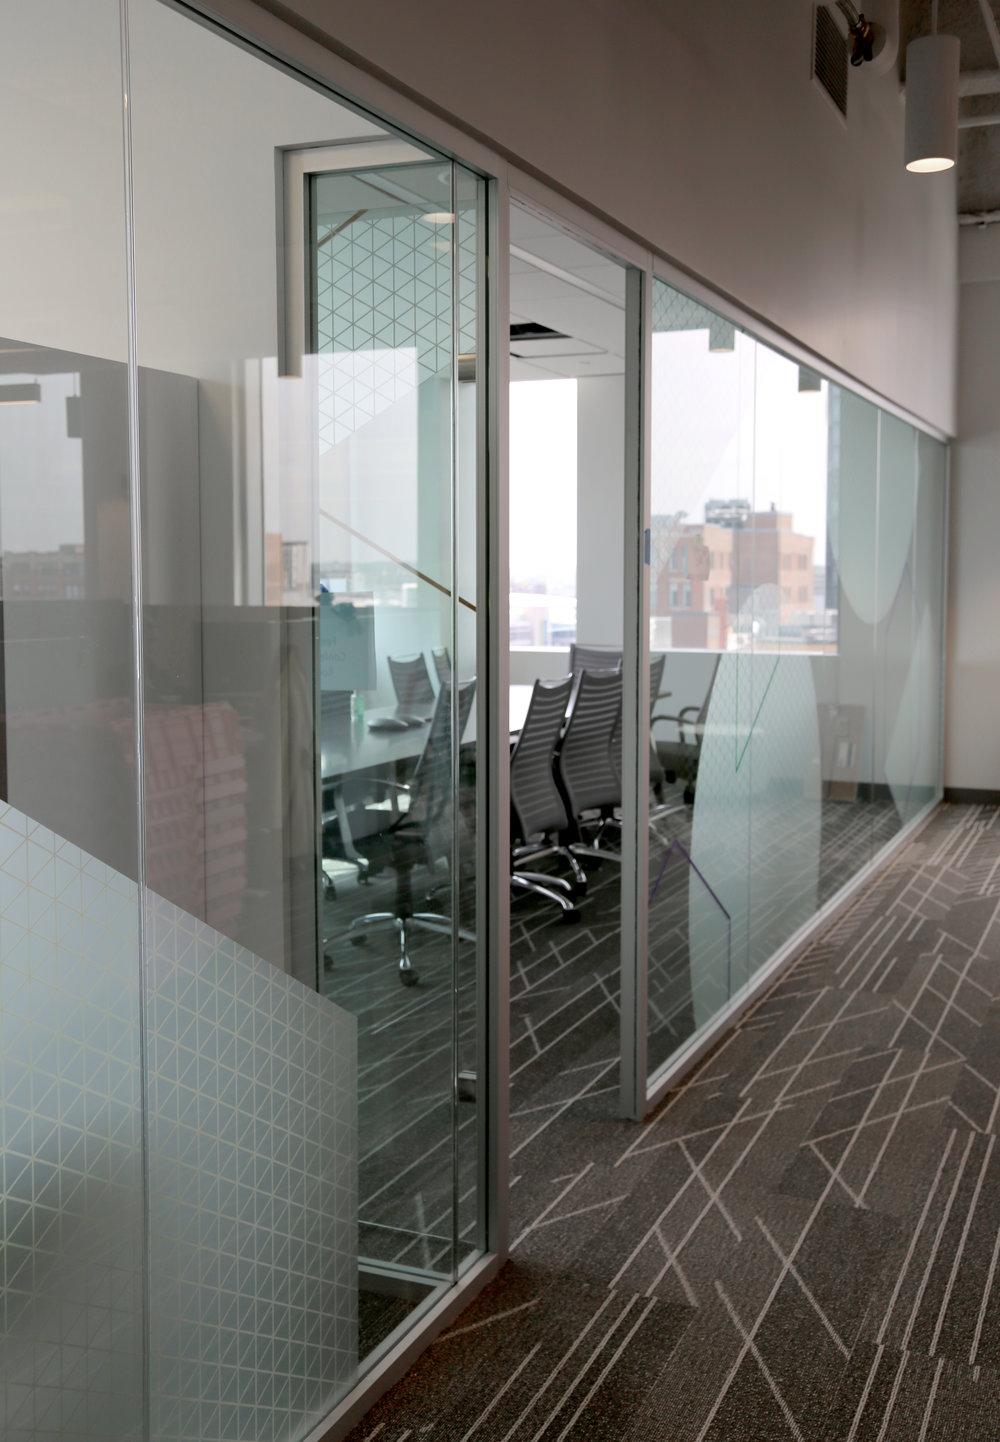 Litespace Glass Return Office Wall System - Spaceworks AI.jpg